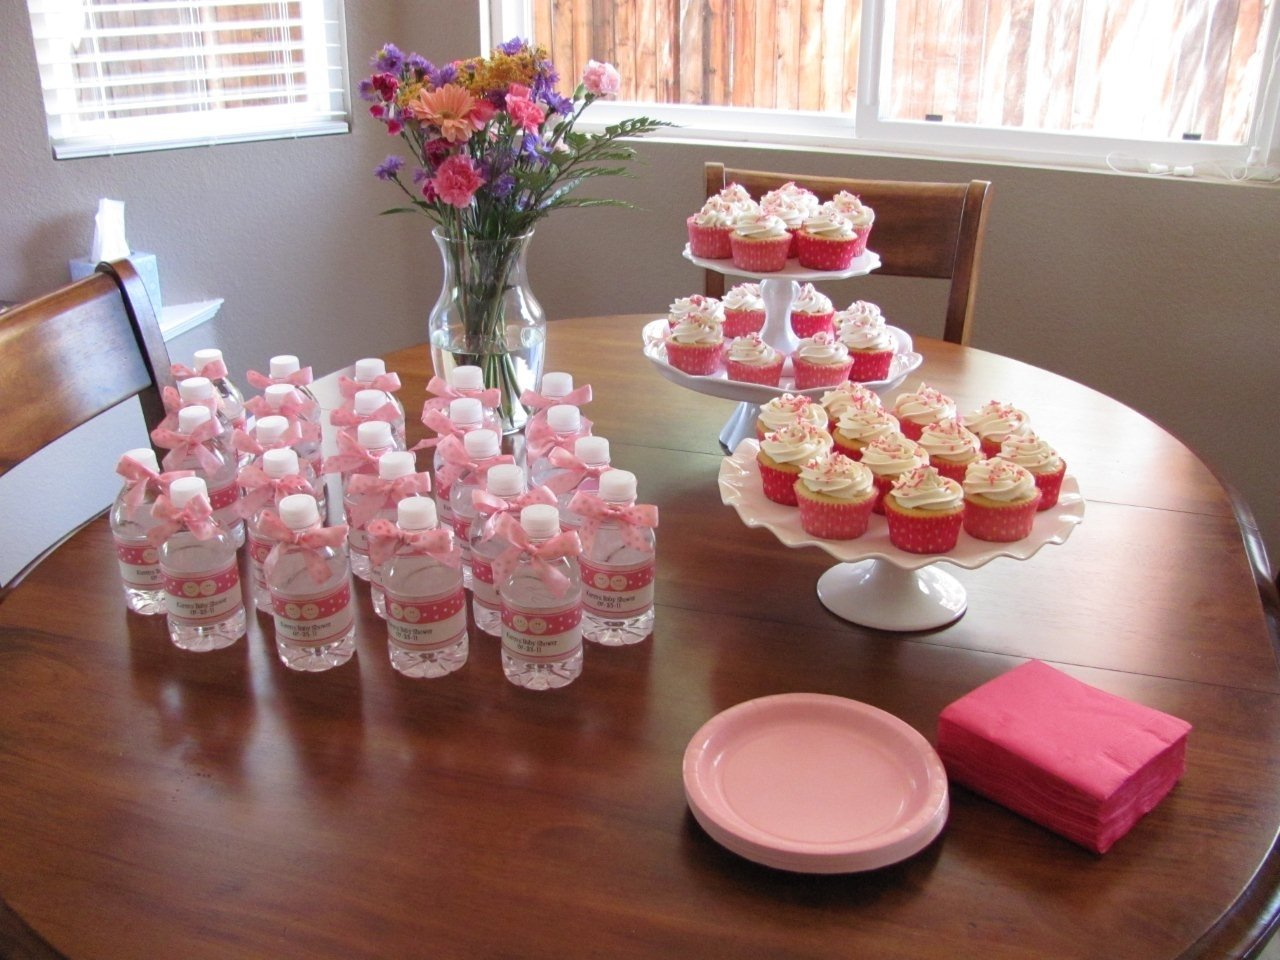 10 Fabulous Baby Shower Table Decoration Ideas dessert table ideas for a baby shower girl baby shower dessert table 2020